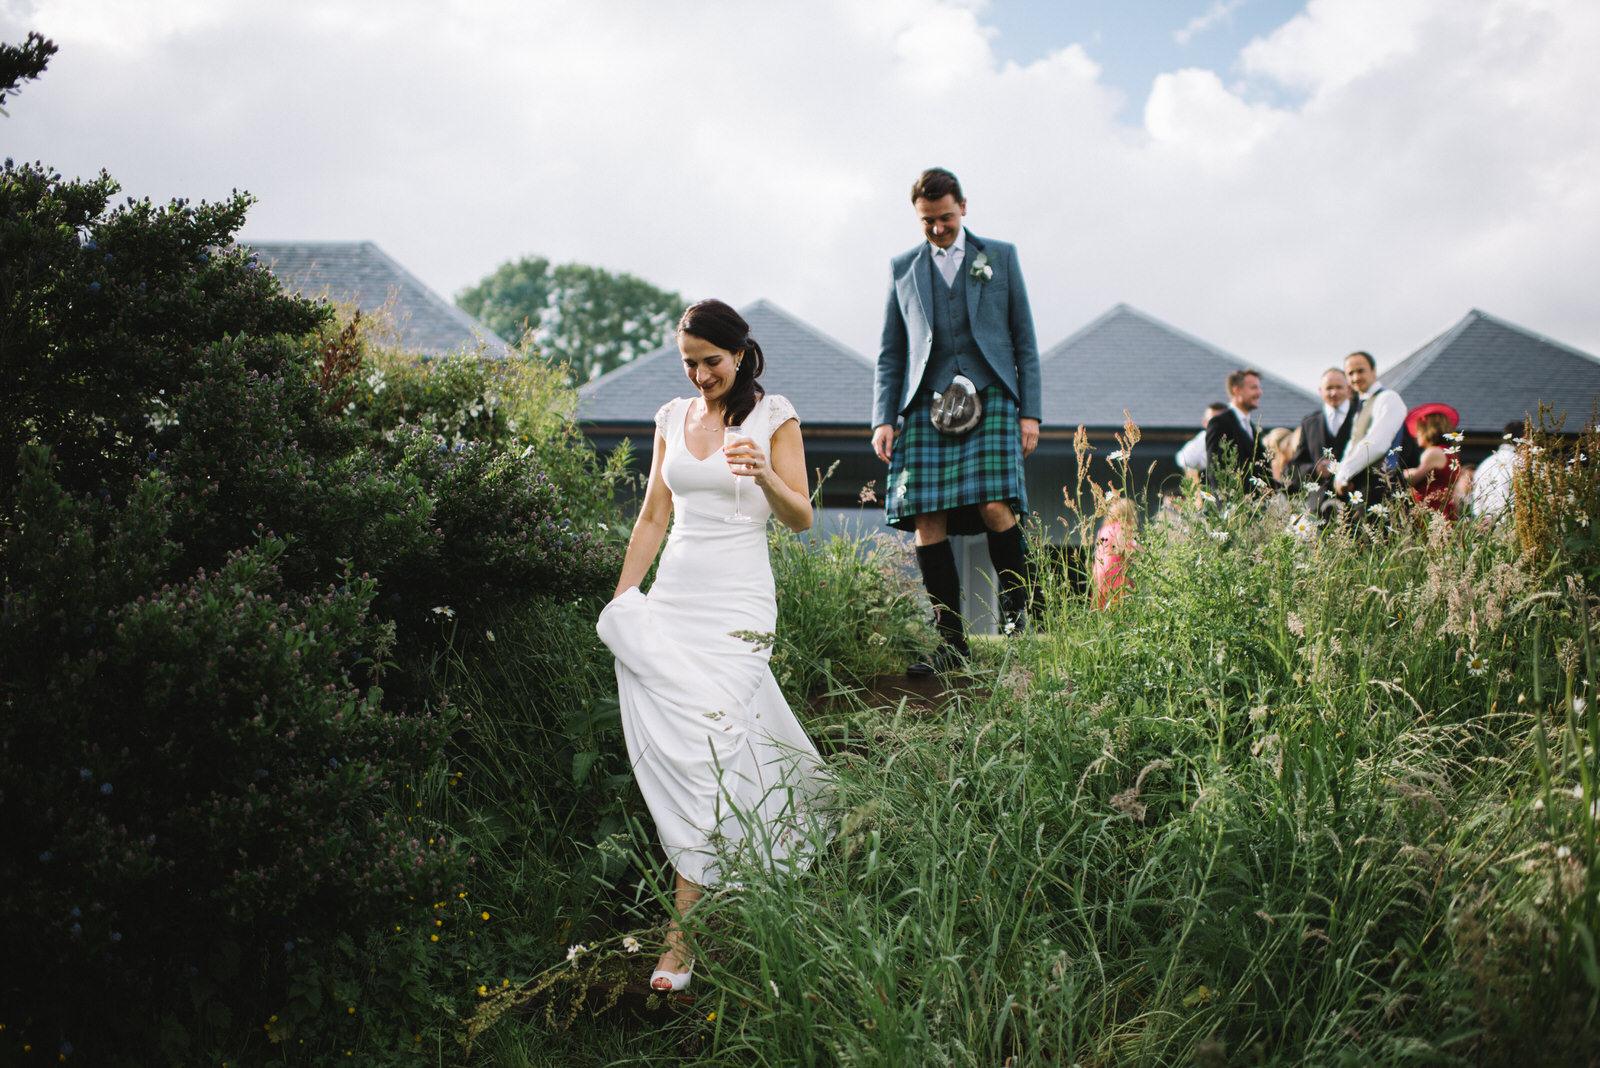 054-GUARDSWELL-FARM-WEDDING-ALTERNATIVE-SCOTTISH-WEDDING-PHOTOGRAPHER-SCOTTISH-WEDDING-DESTINATION-WEDDING-PHOTOGRAPHER.JPG